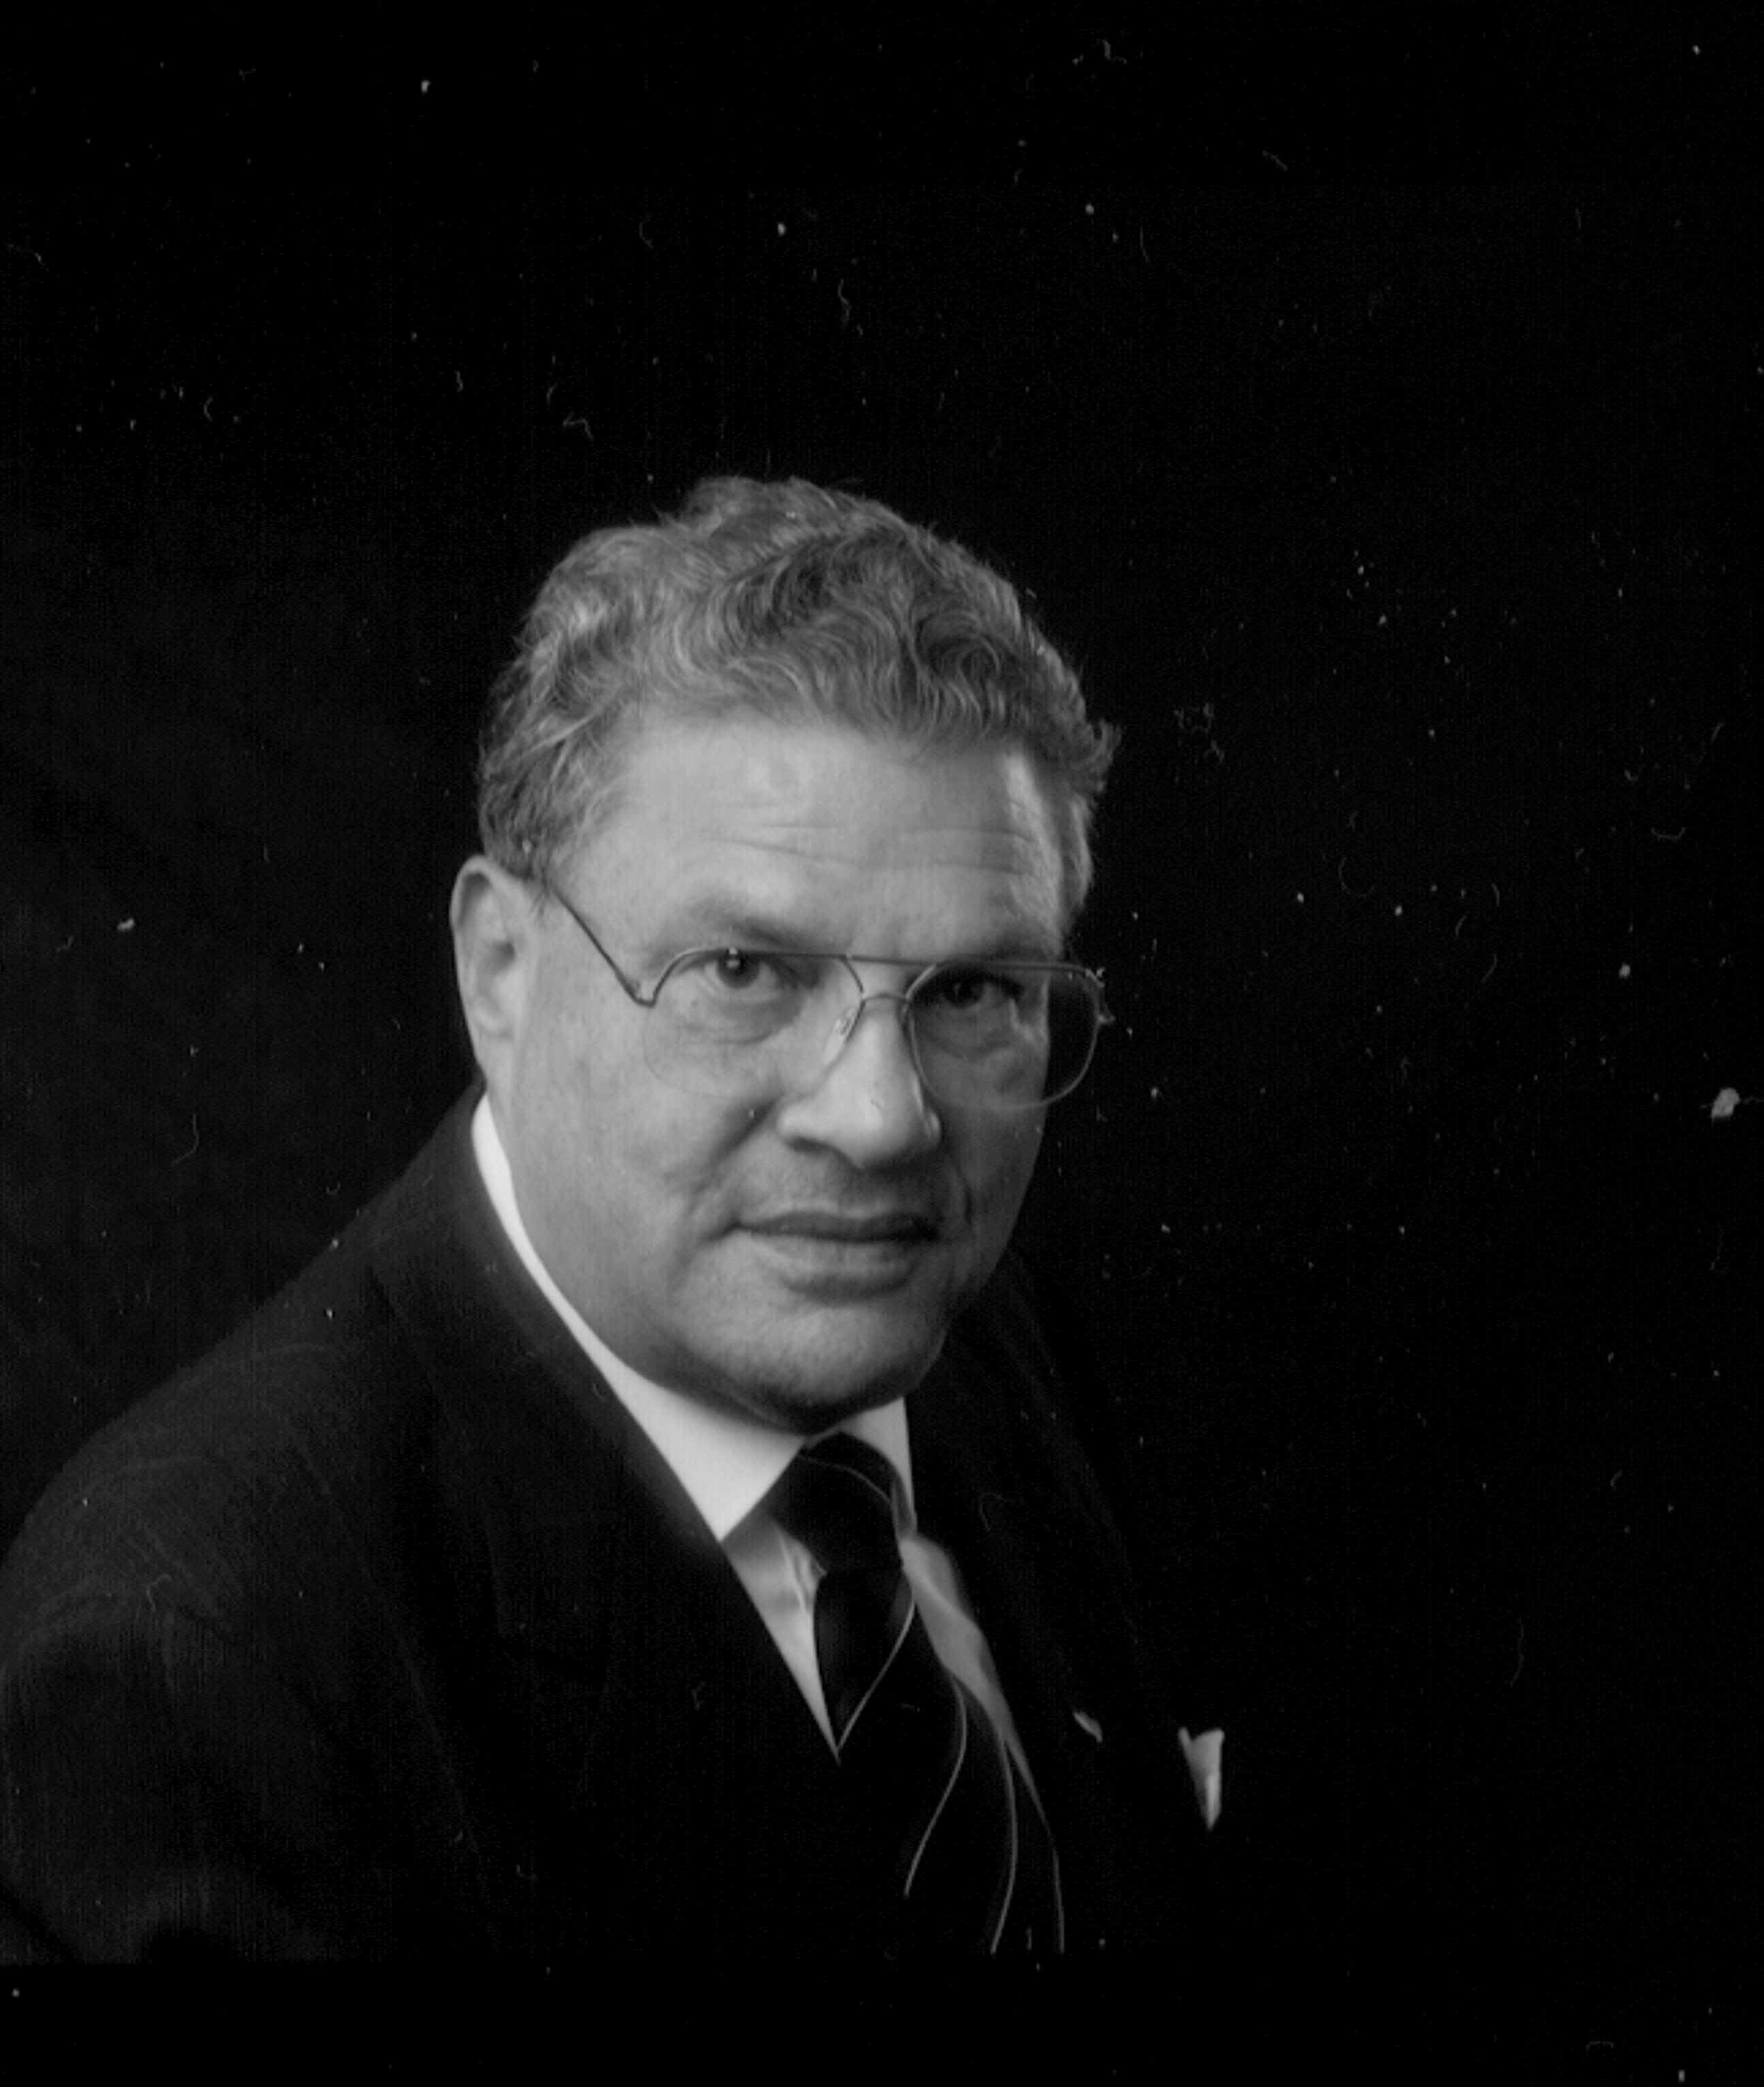 Stephen G. Esrati